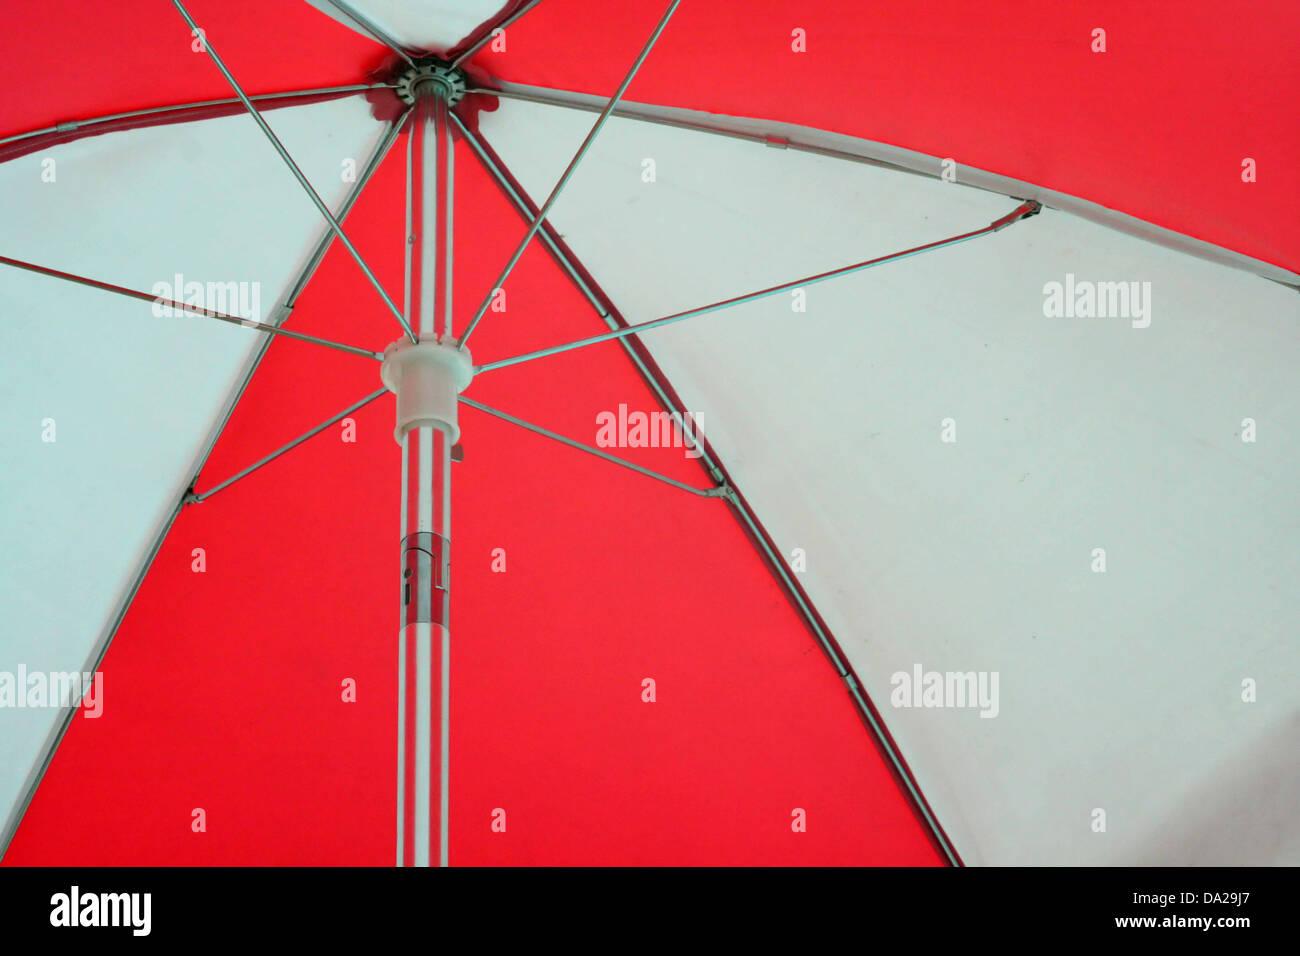 red white umbrella beach sun rain lifeguard lifeguards umbrellas weather forecast - Stock Image